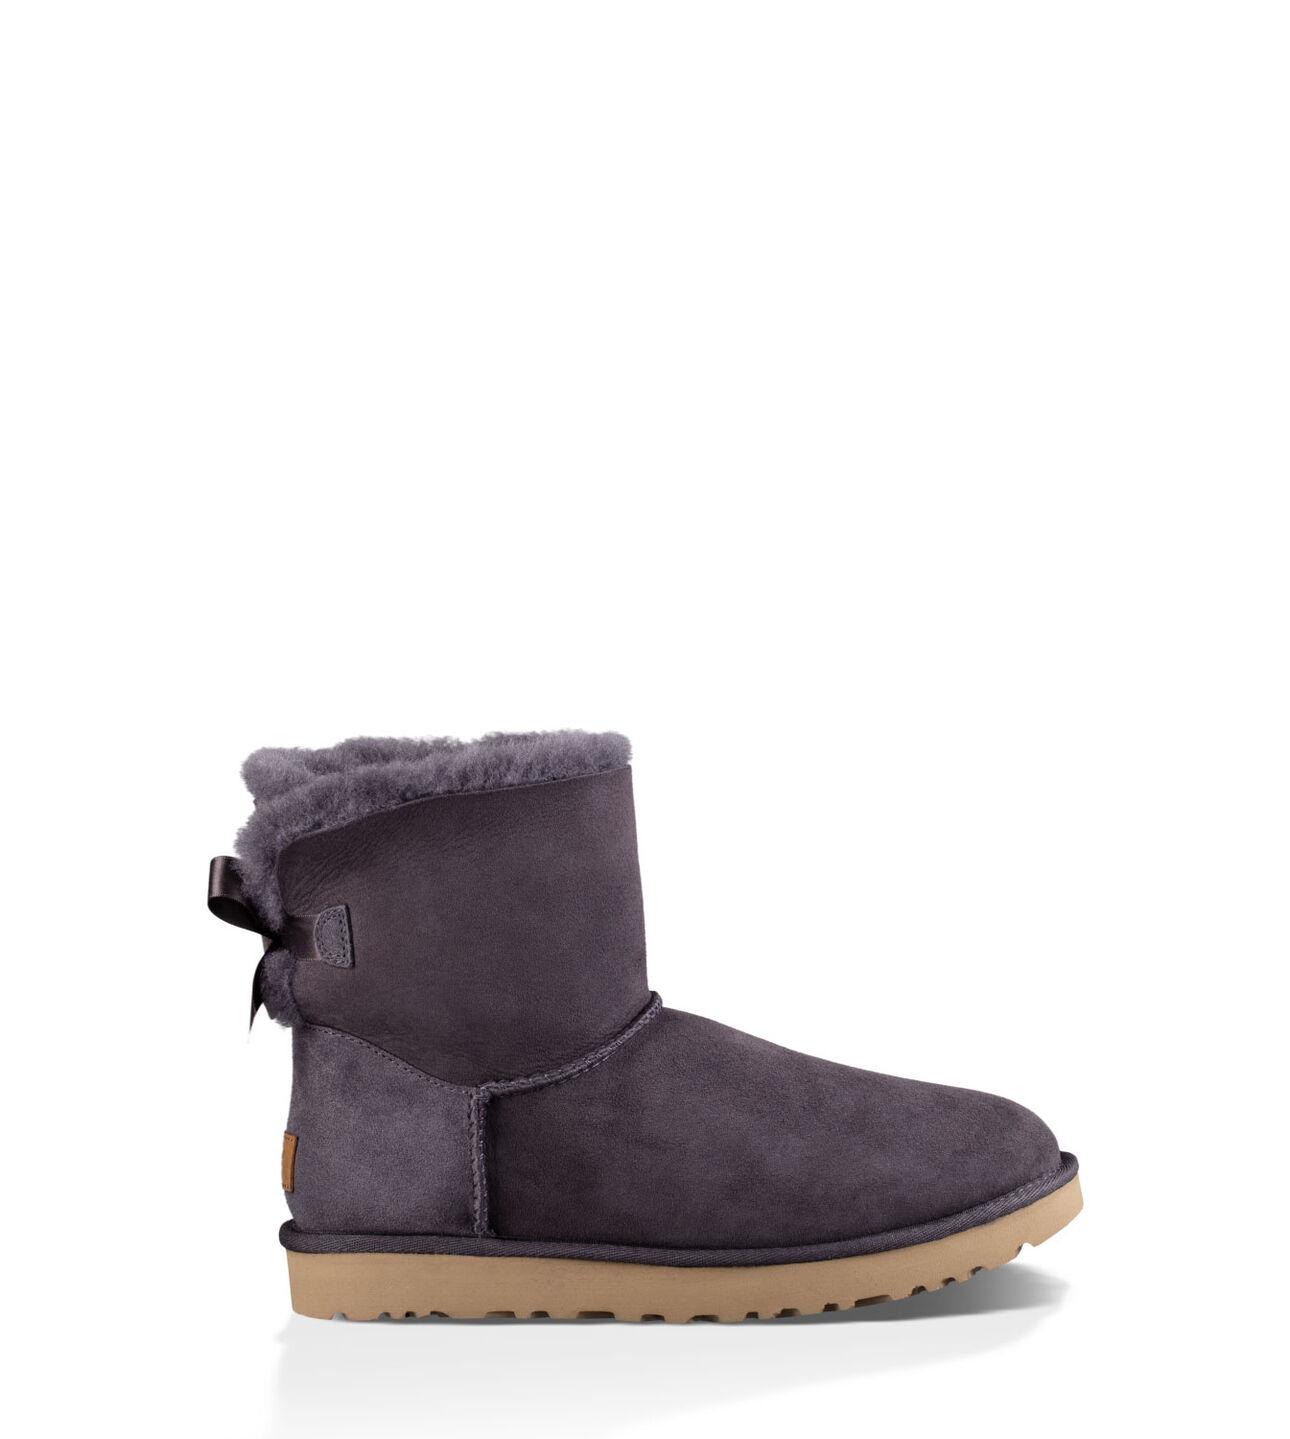 ugg mini bailey bow ii classic mini boots for women ugg uk. Black Bedroom Furniture Sets. Home Design Ideas